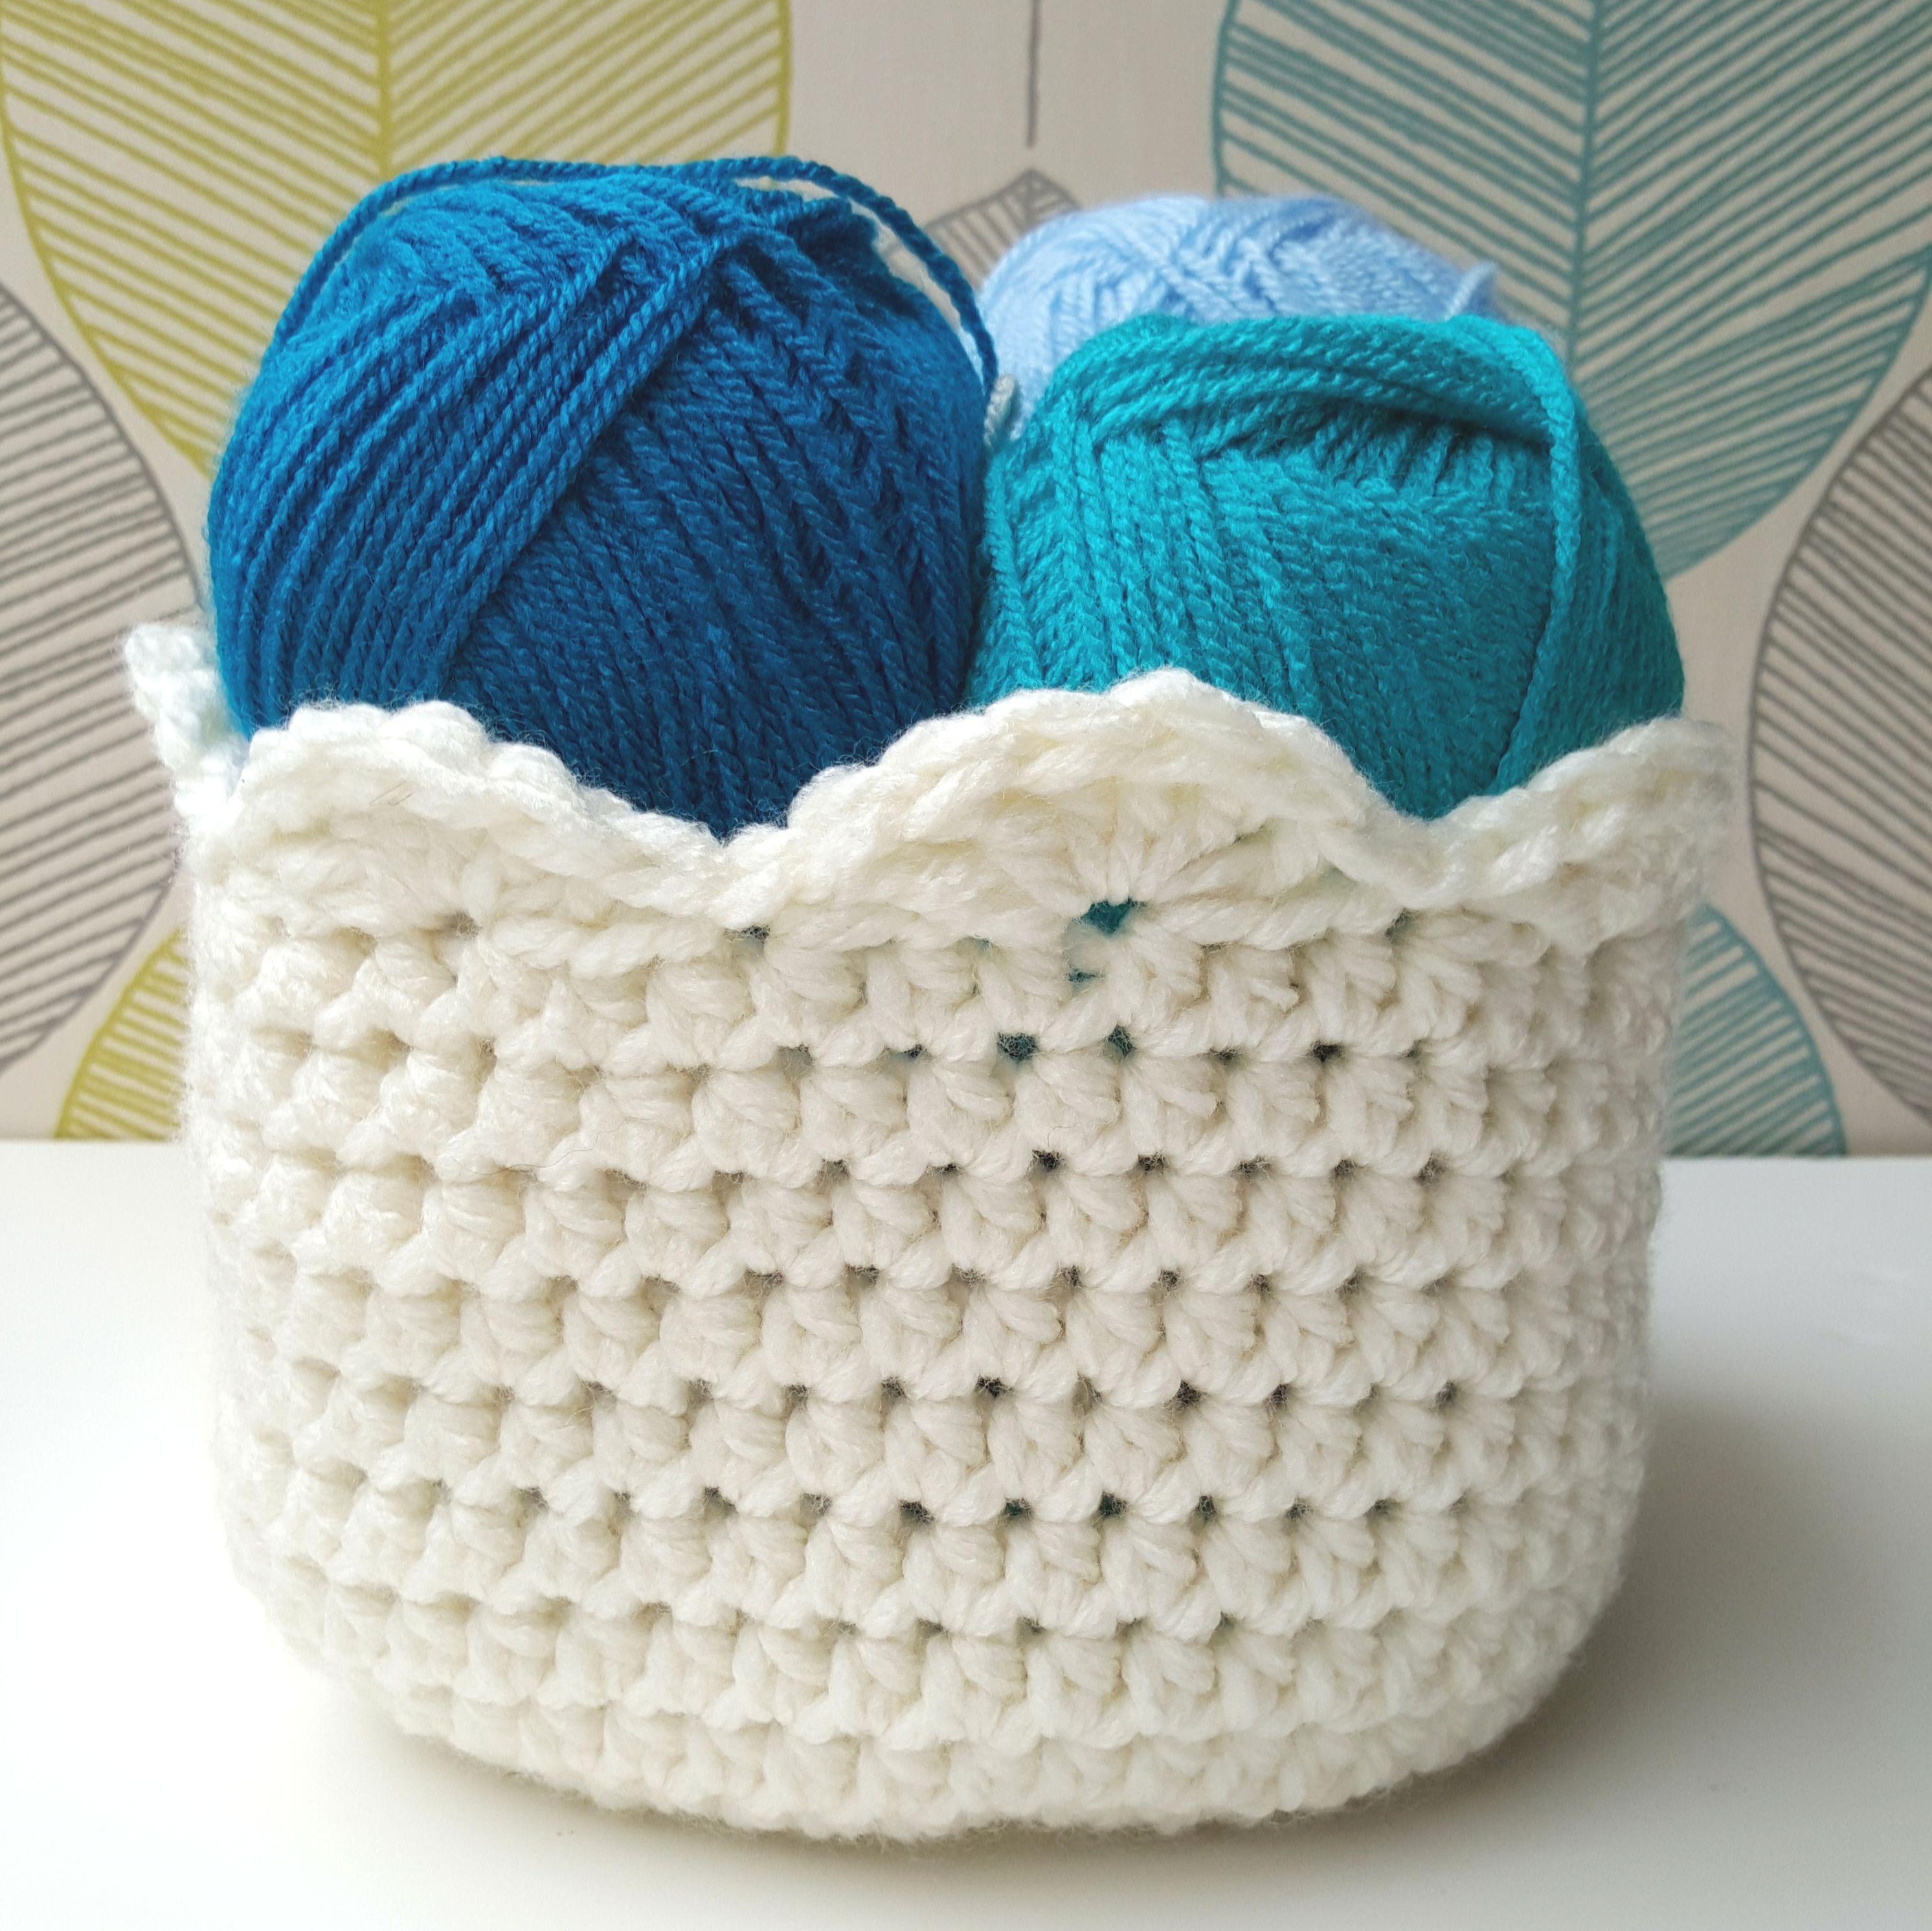 How to Crochet a Basket: FREE Tutorial & Pattern | Tejido, Ganchillo ...